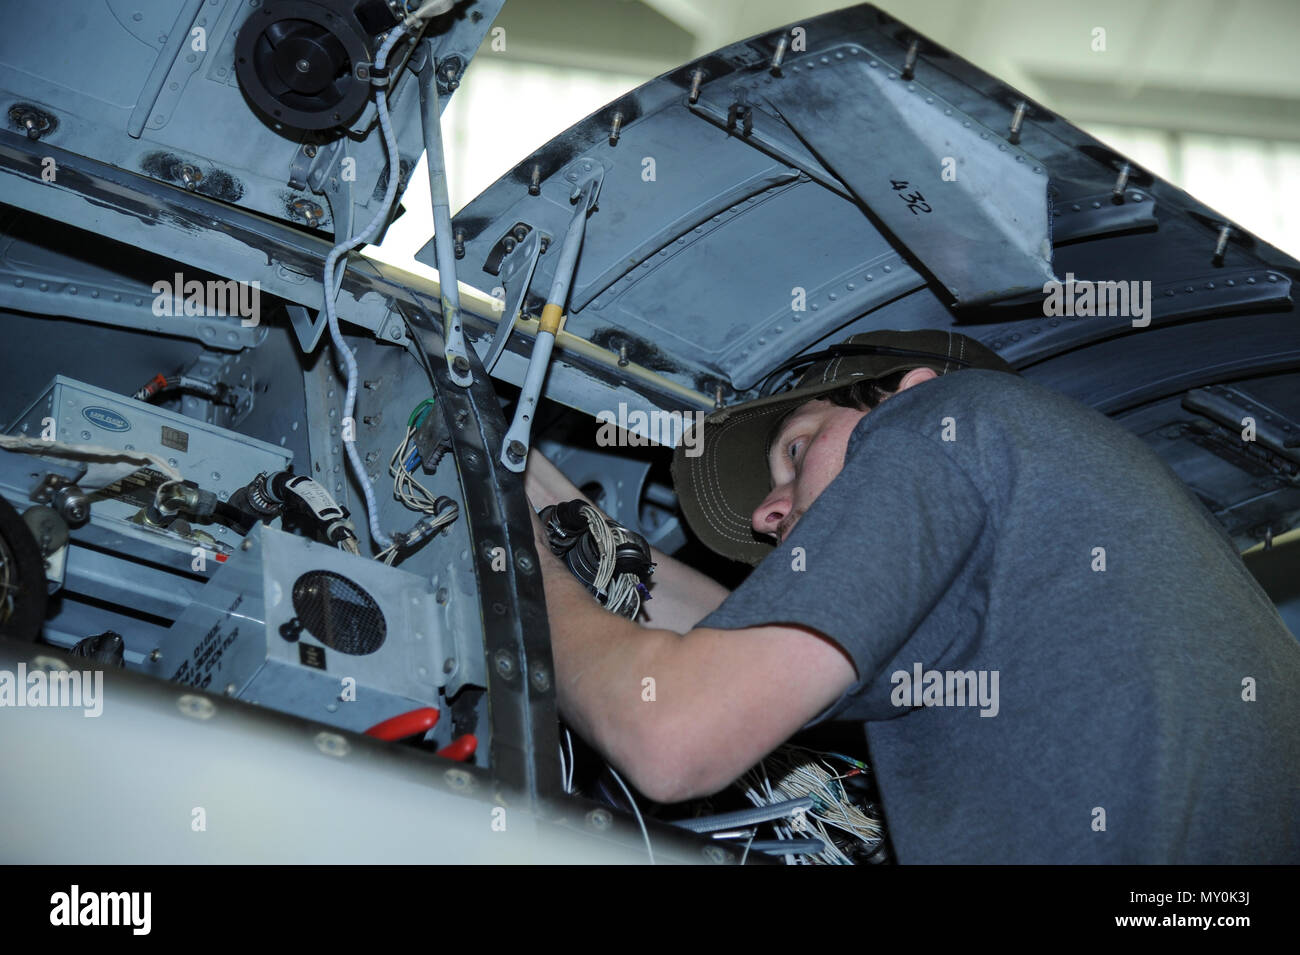 hight resolution of aaron miller 309th aircraft maintenance and regeneration group aircraft technician installs a wiring harness